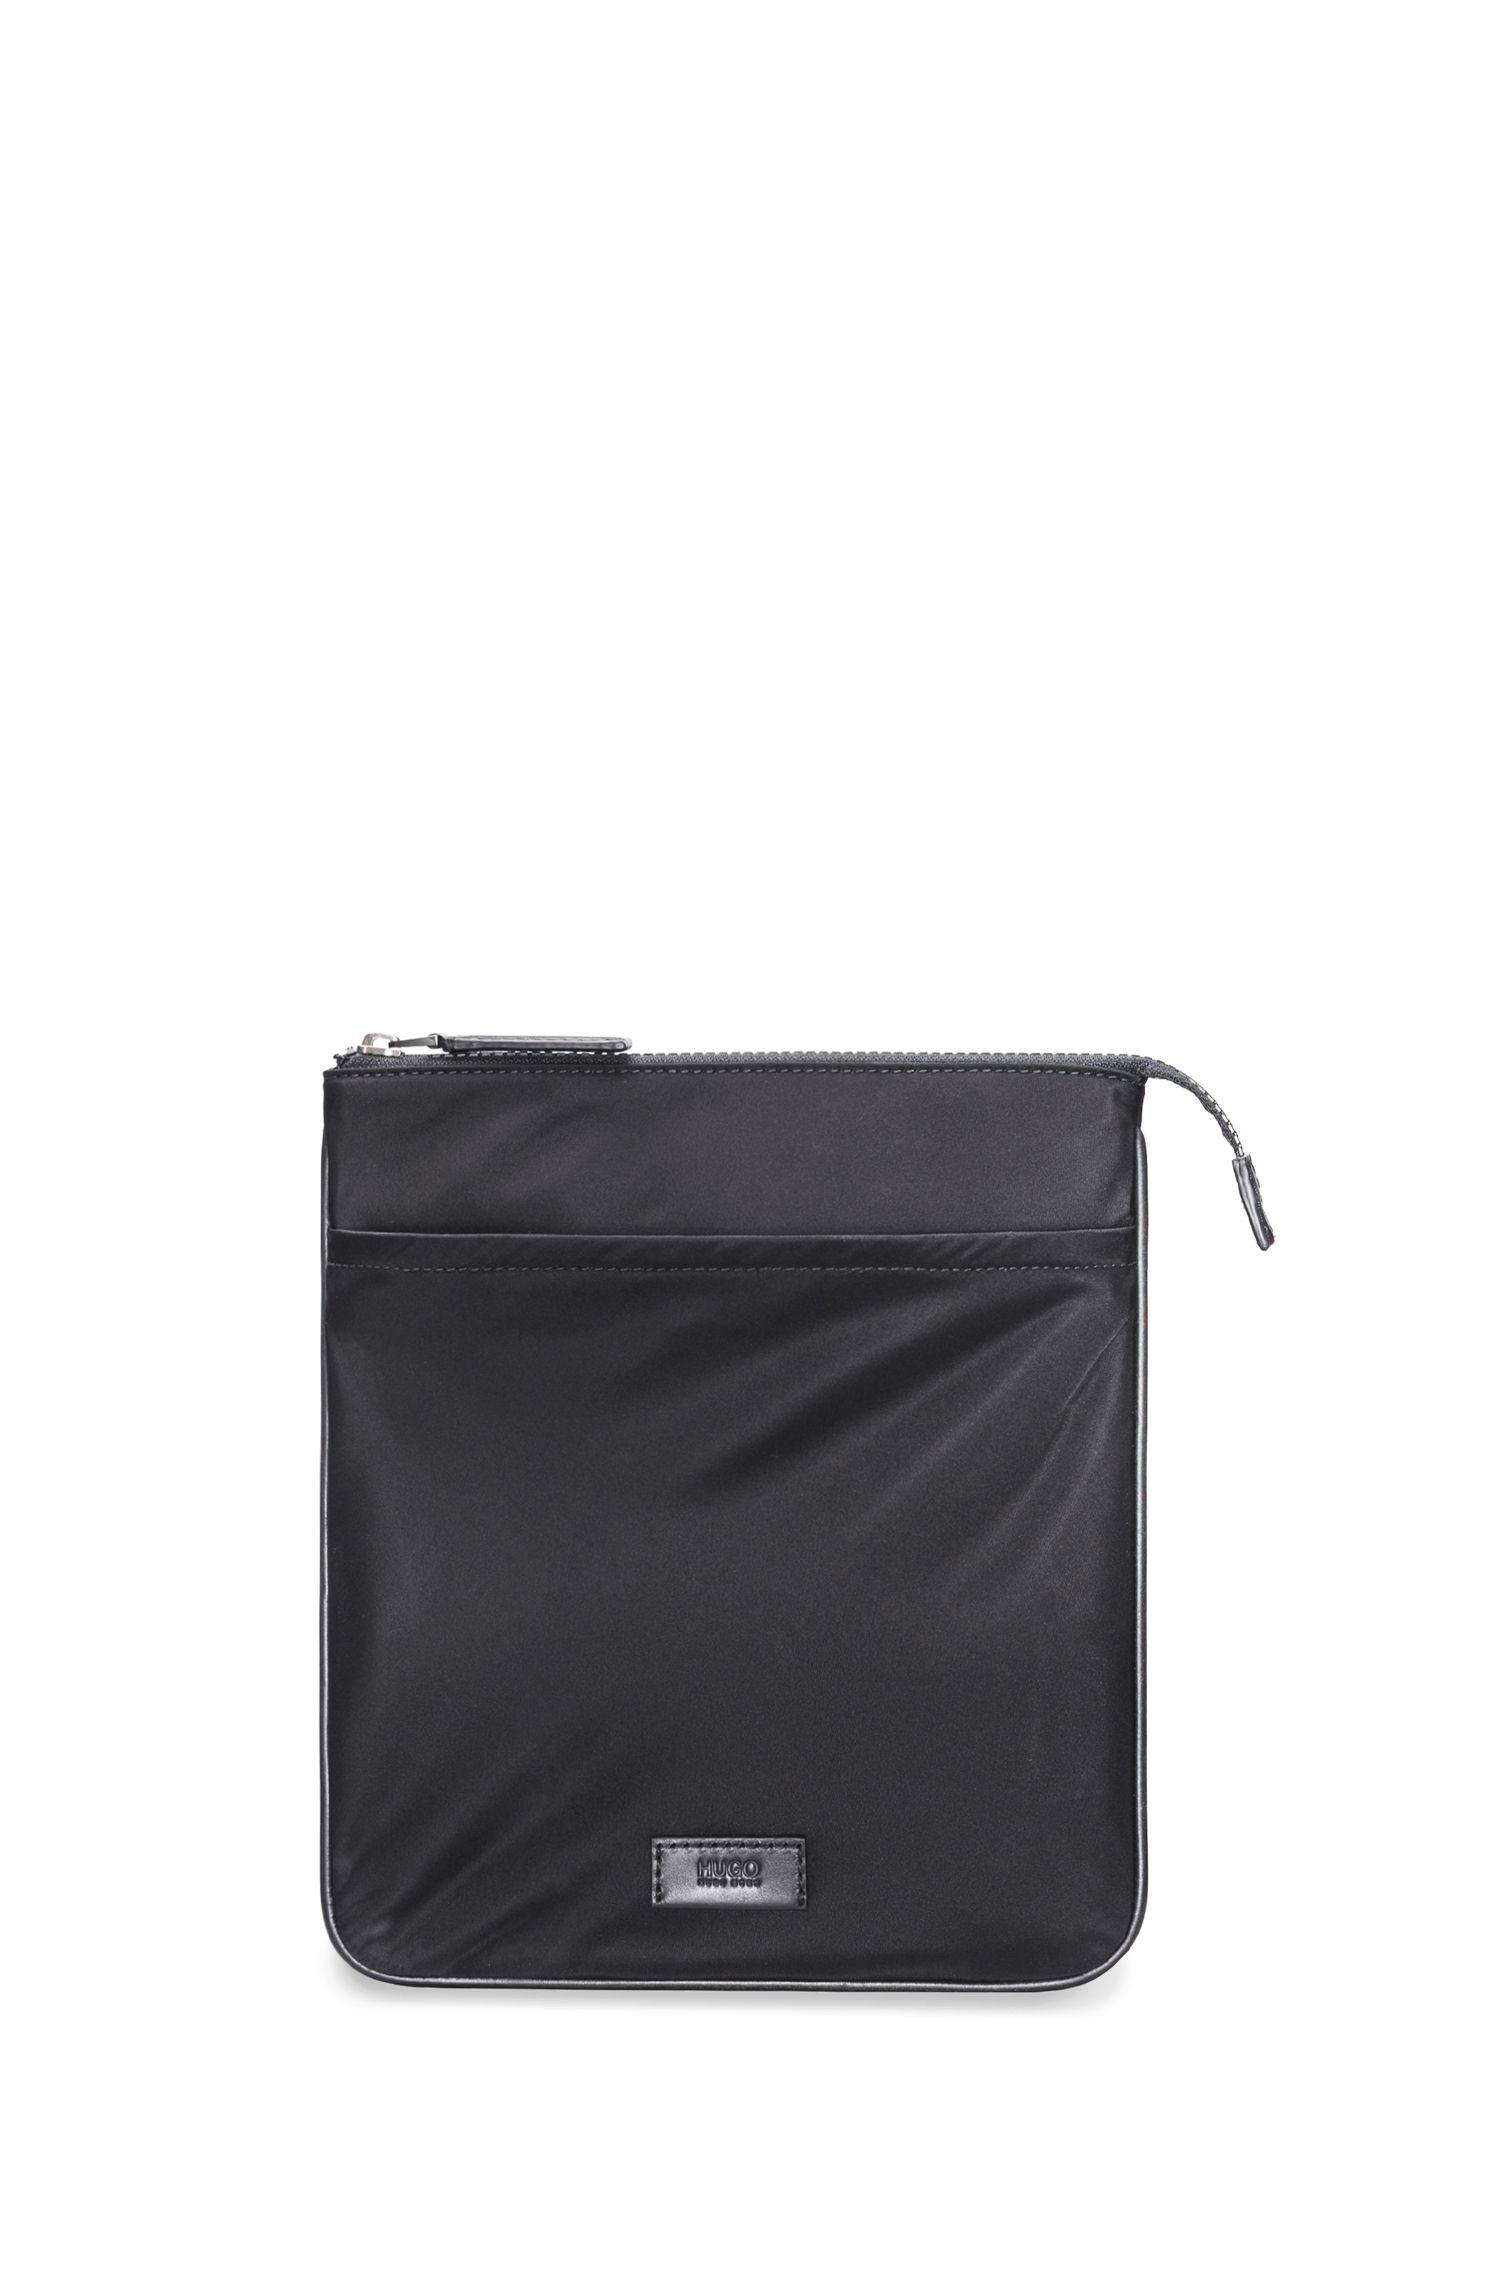 Envelope bag in gabardine nylon with leather trims